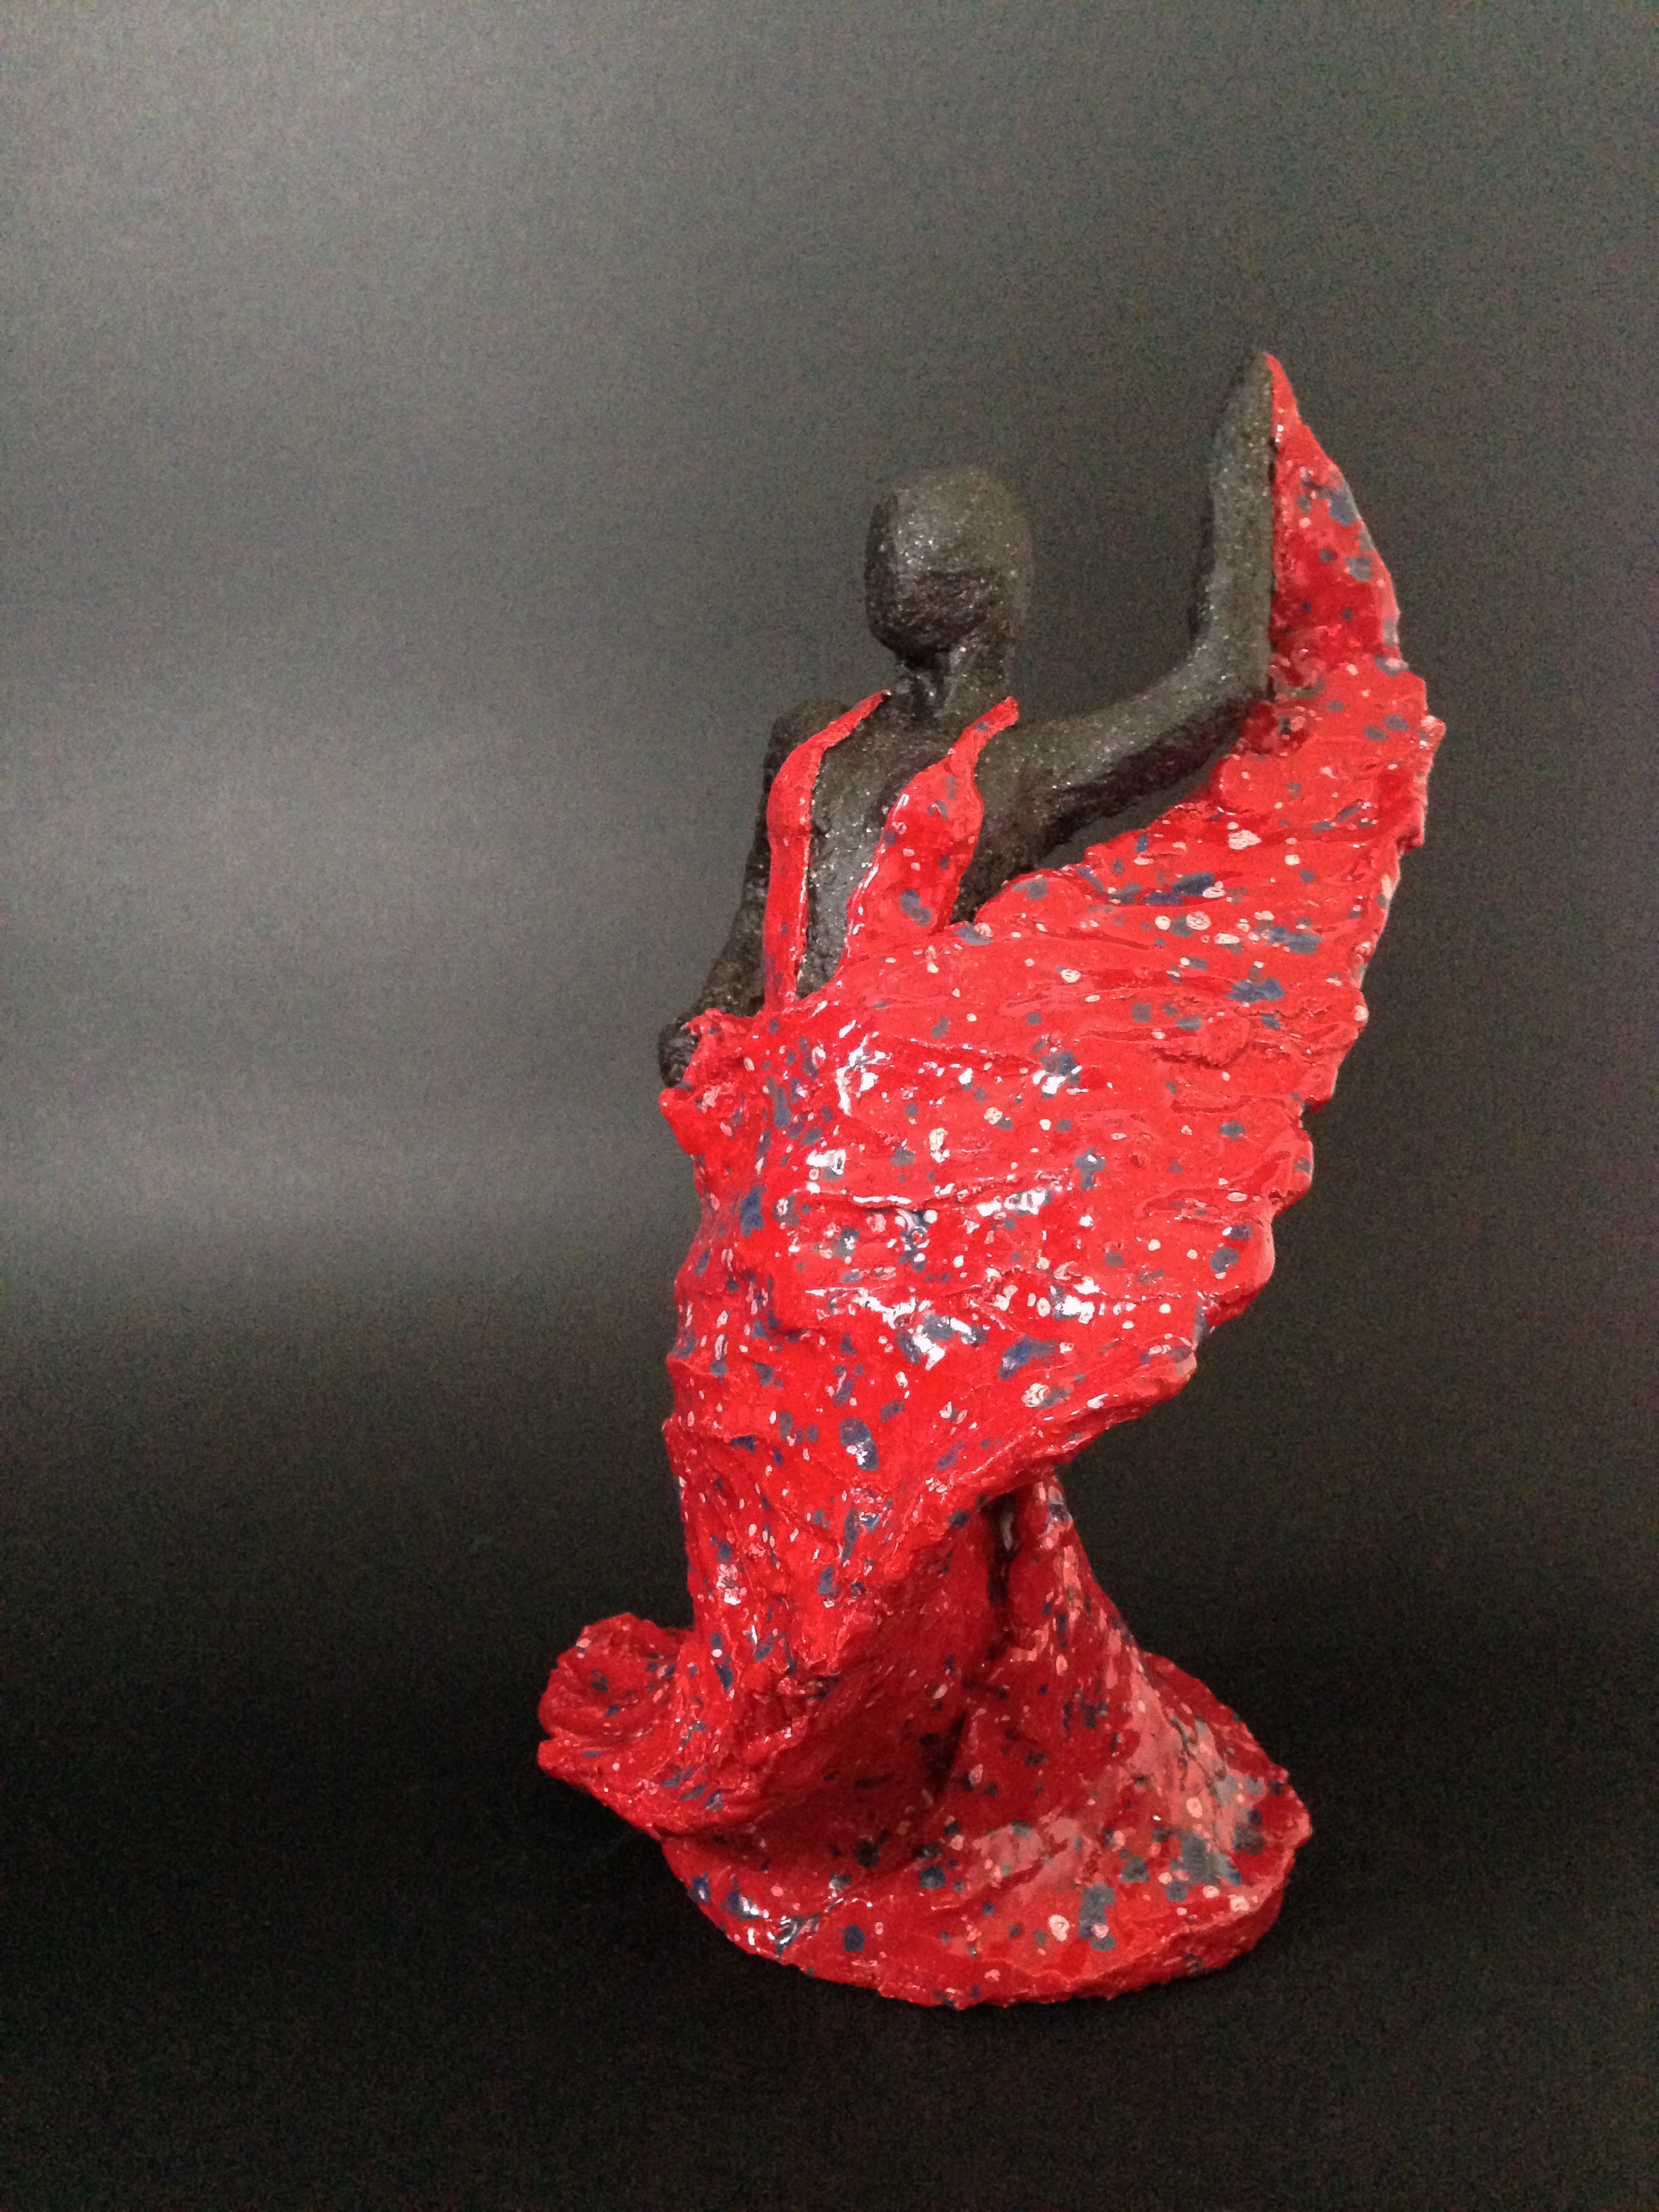 51. Flamenco Flames